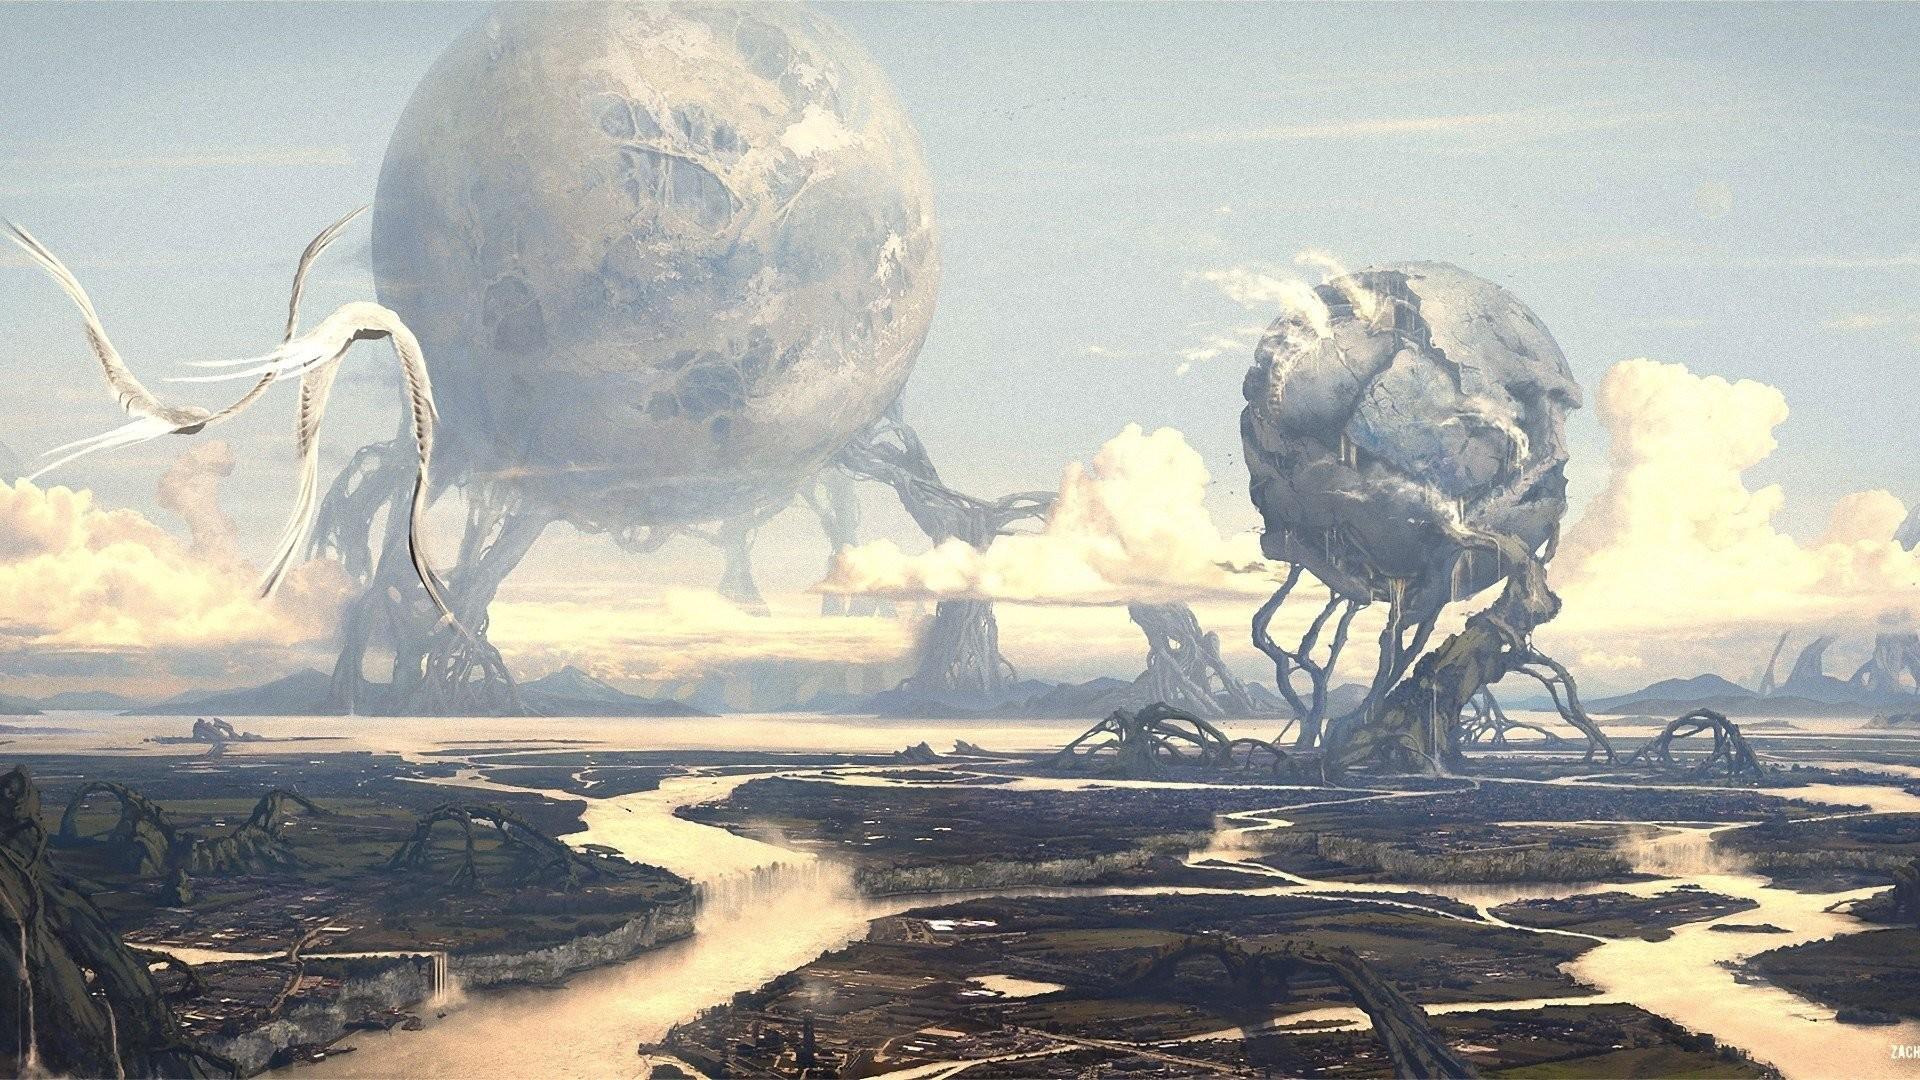 HD Wallpaper   Background ID:325448. Sci Fi Landscape